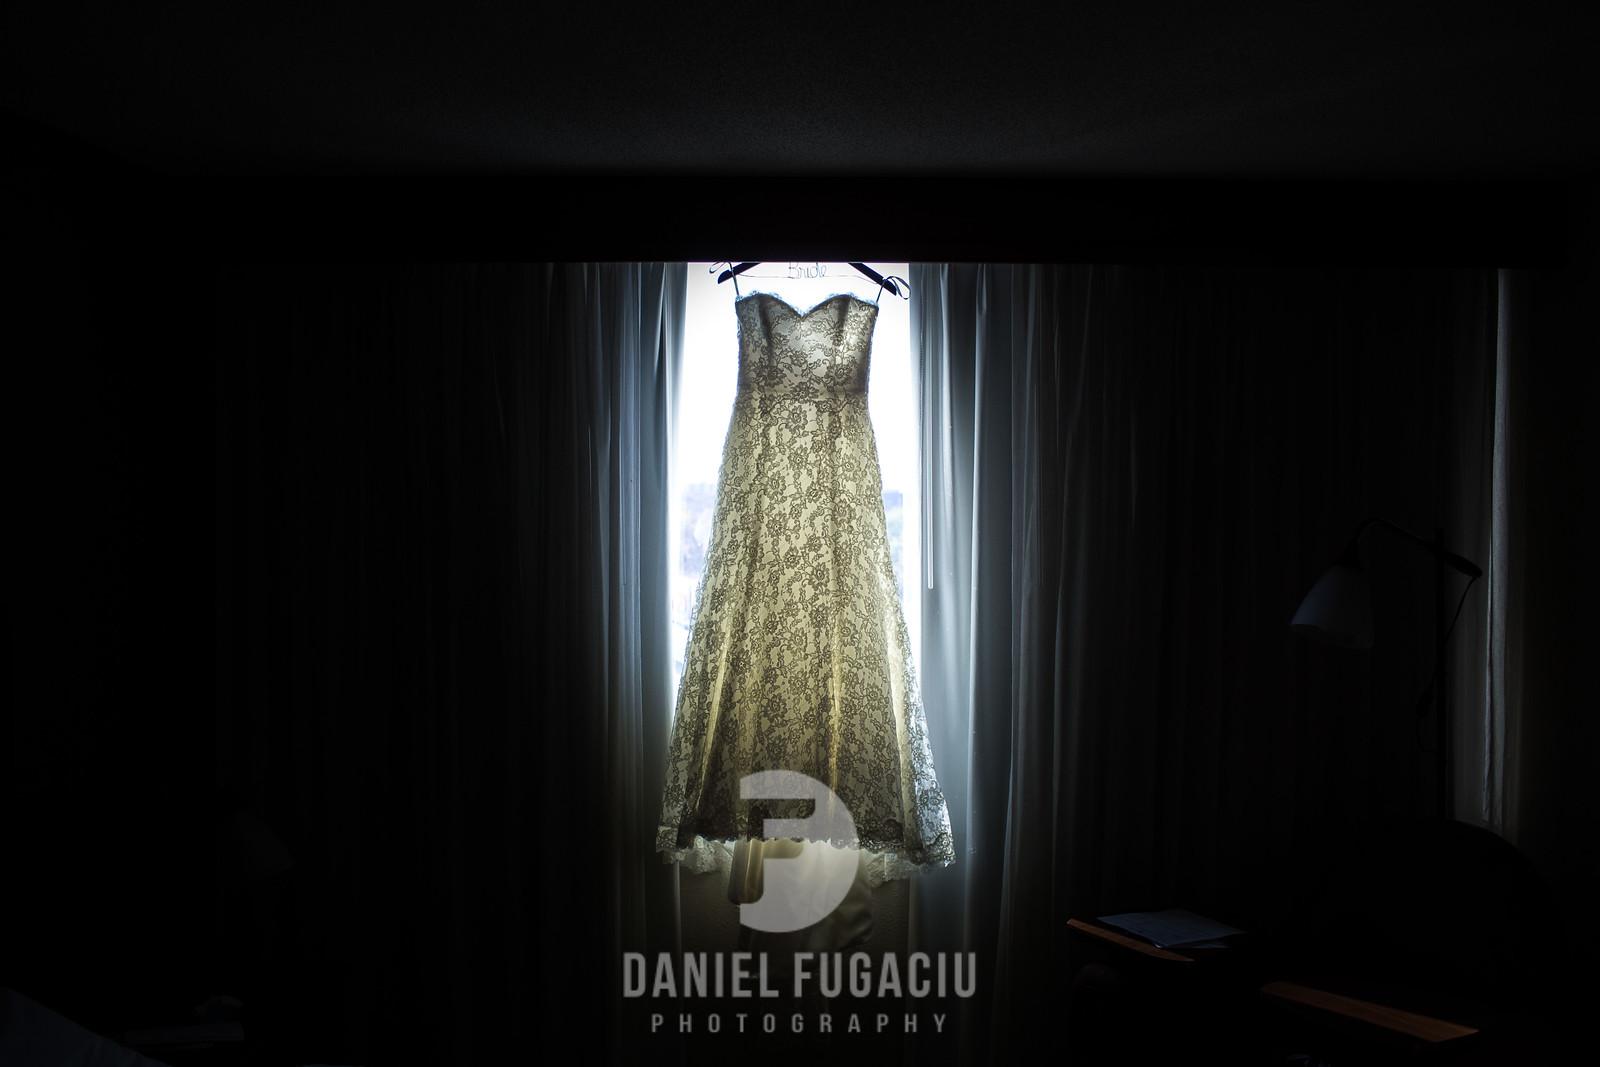 Daniel_Fugaciu_Photography_Liz_Rob_Real_Weddding_April_Lynn_Designs_The_Merion_New_Jersey_Brugundy_Gold_Wedding3